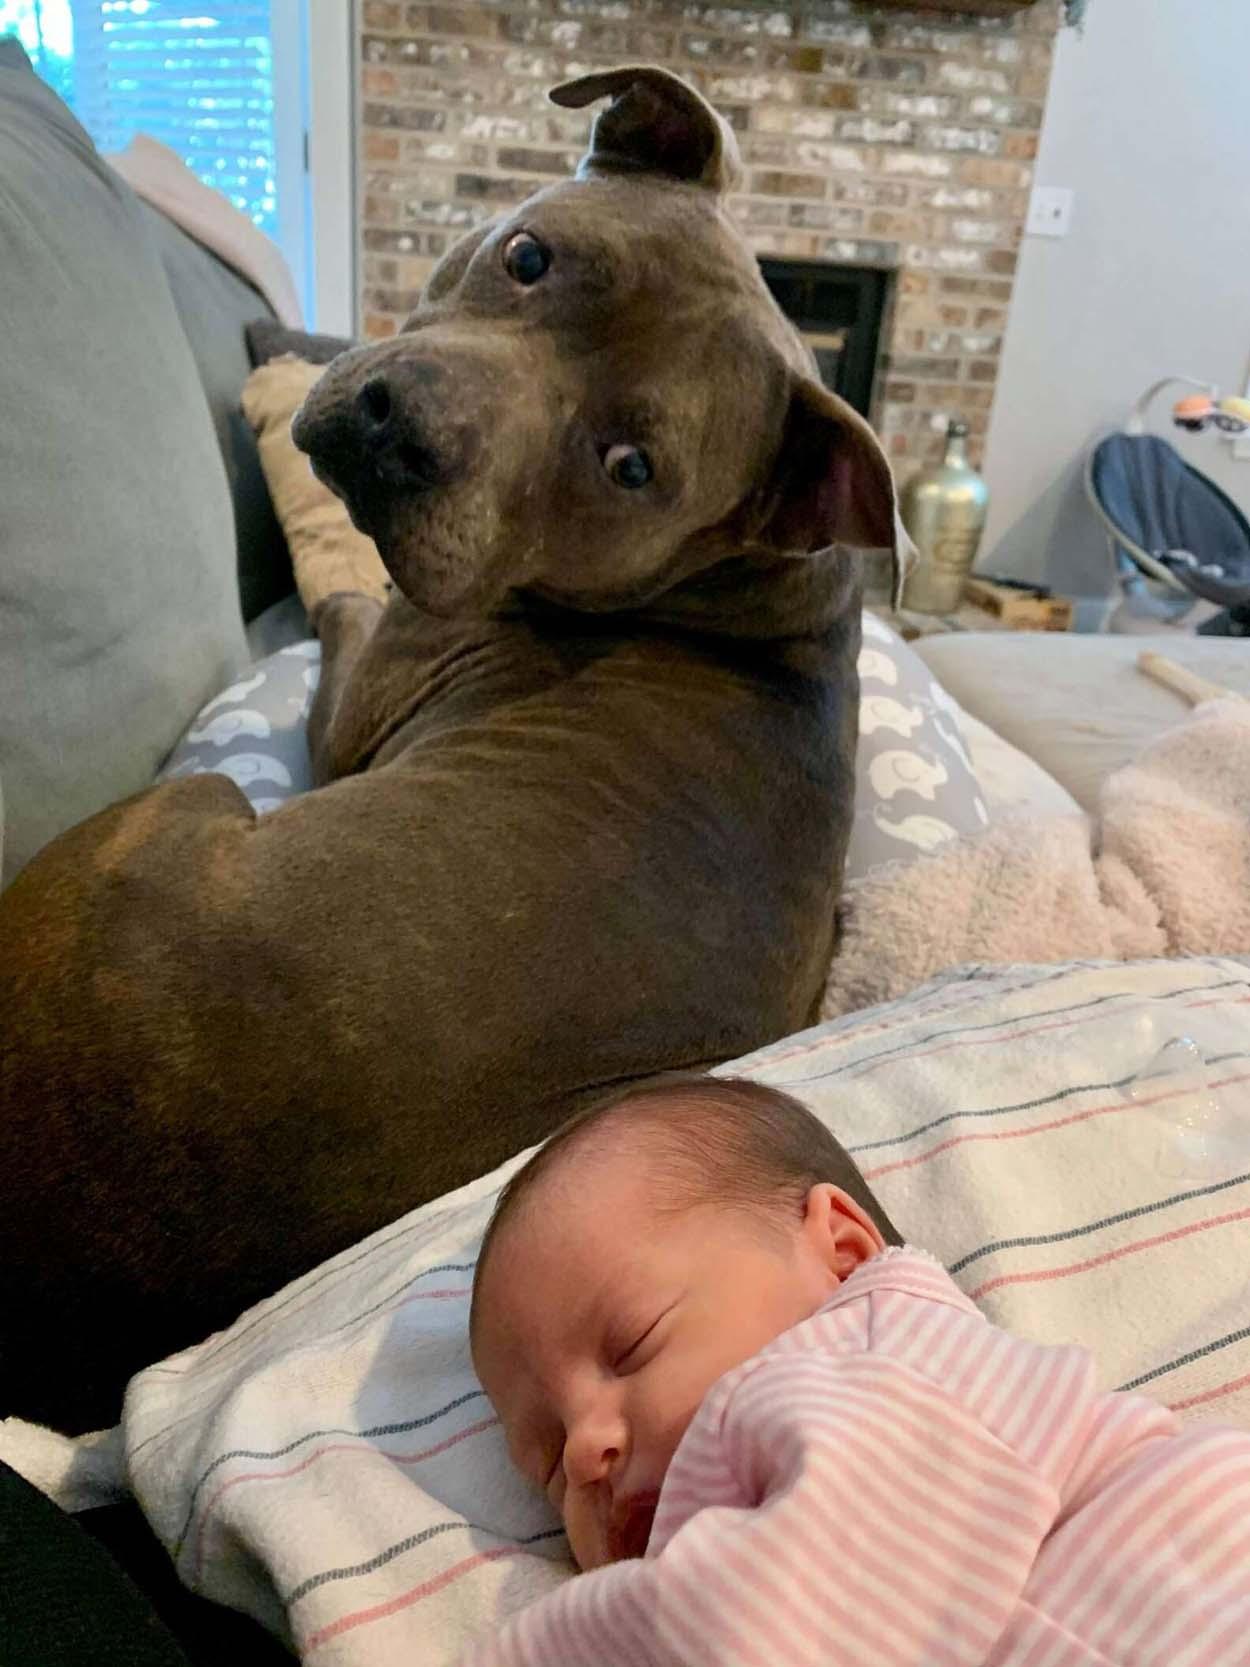 Perro reacciona al escuchar el llanto del bebé